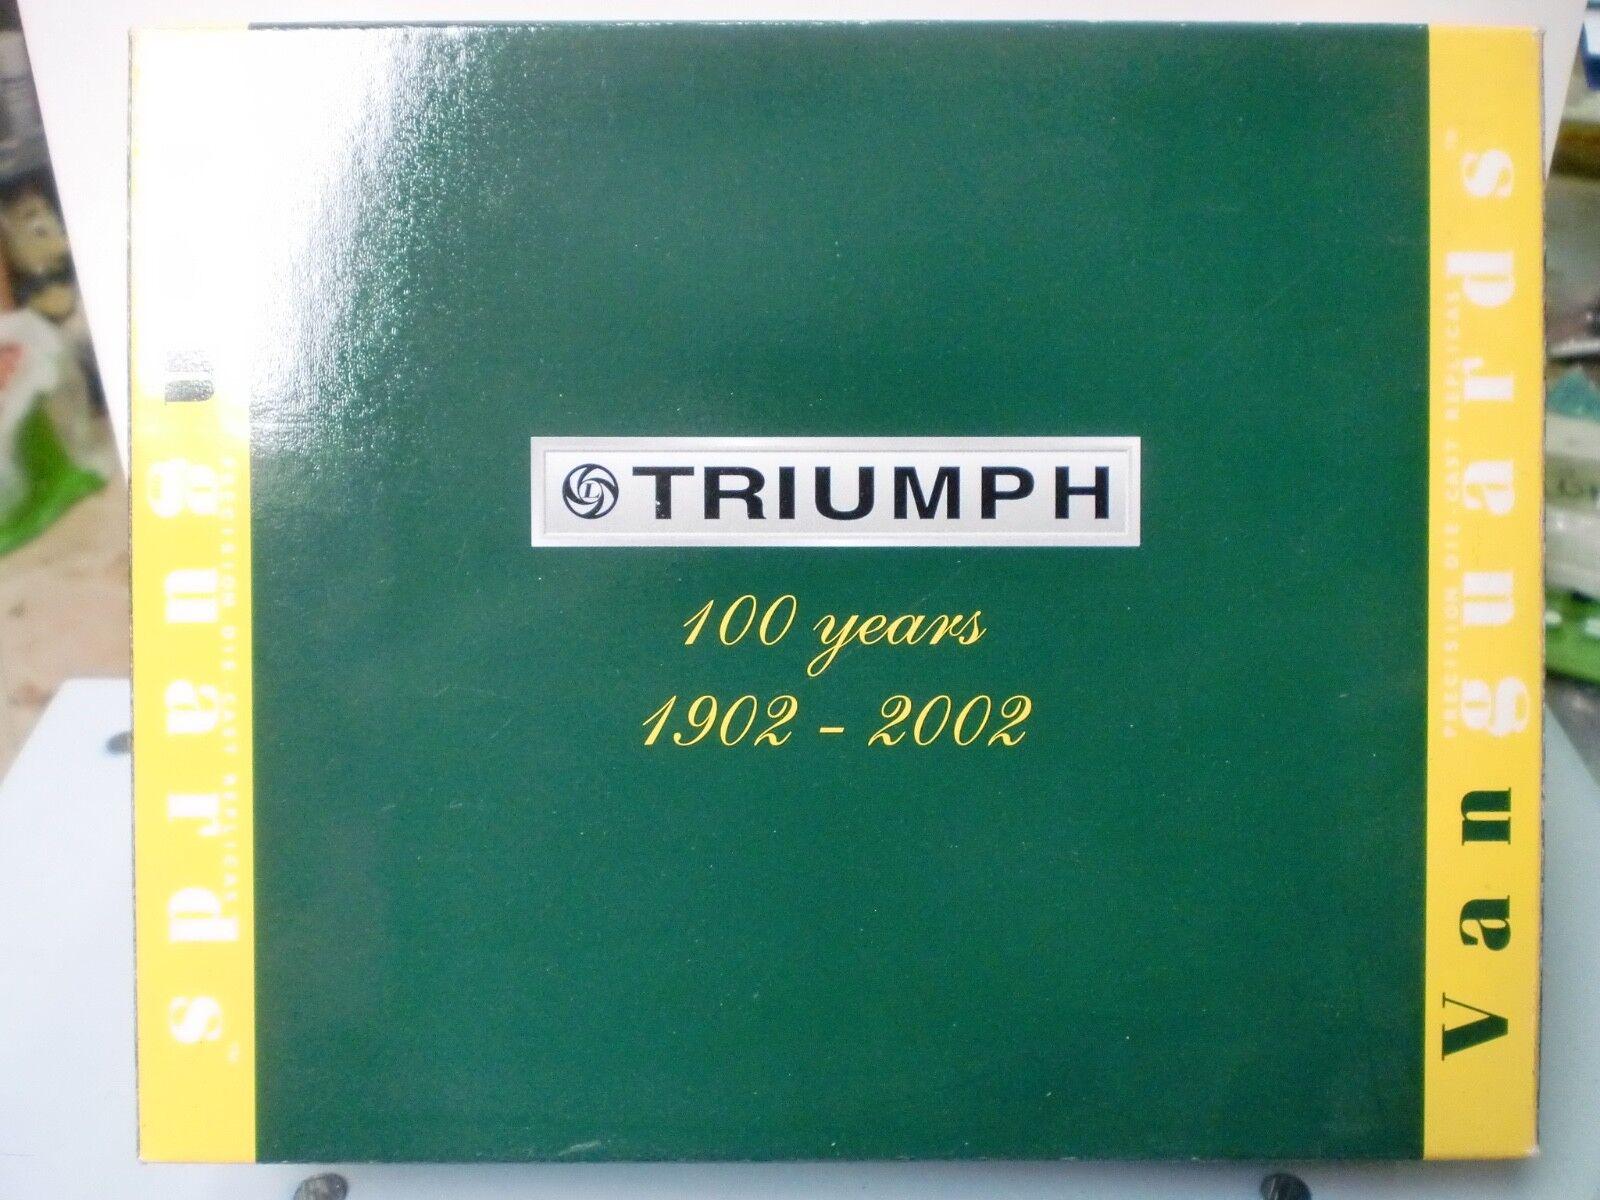 VANGUARD VANGUARD VANGUARD 1 43 - TRIUMPH 100 YEARS 1902-2002 - TC1003 263548